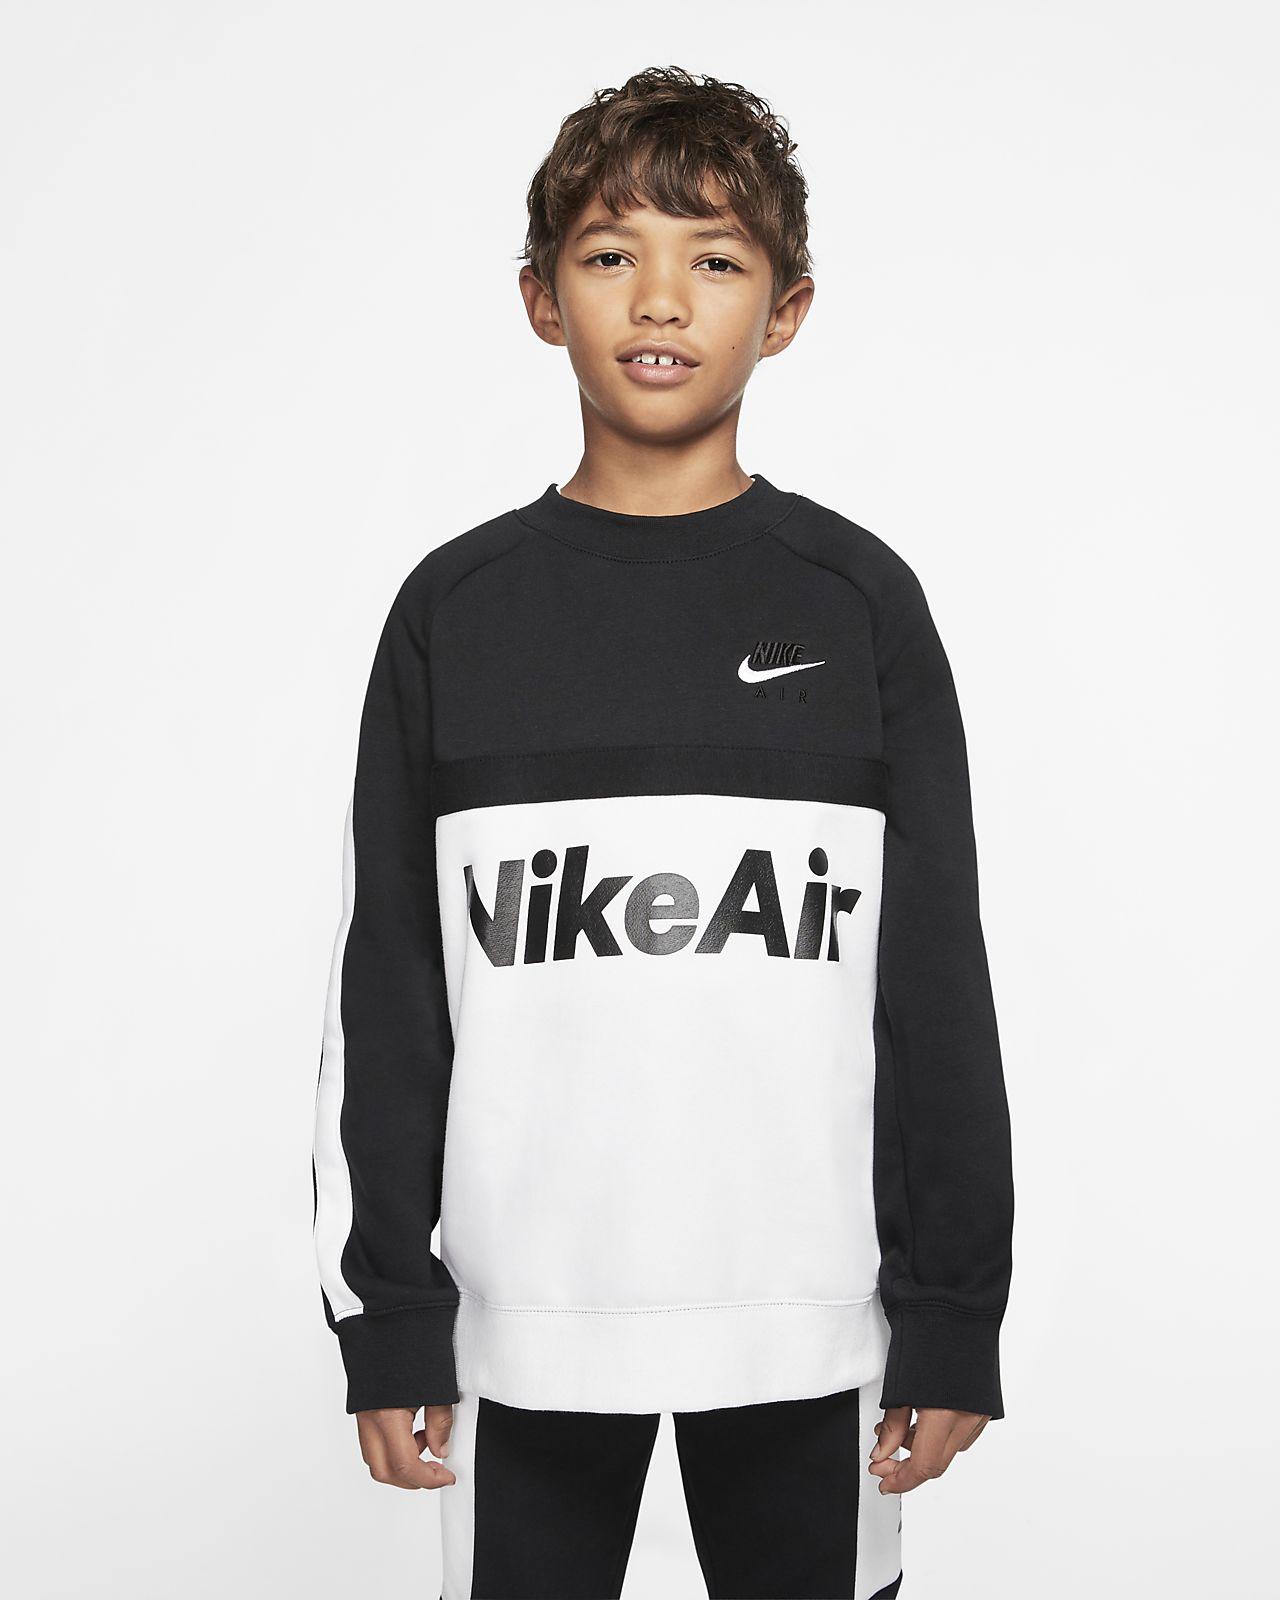 Boys' Clothing. Nike LU